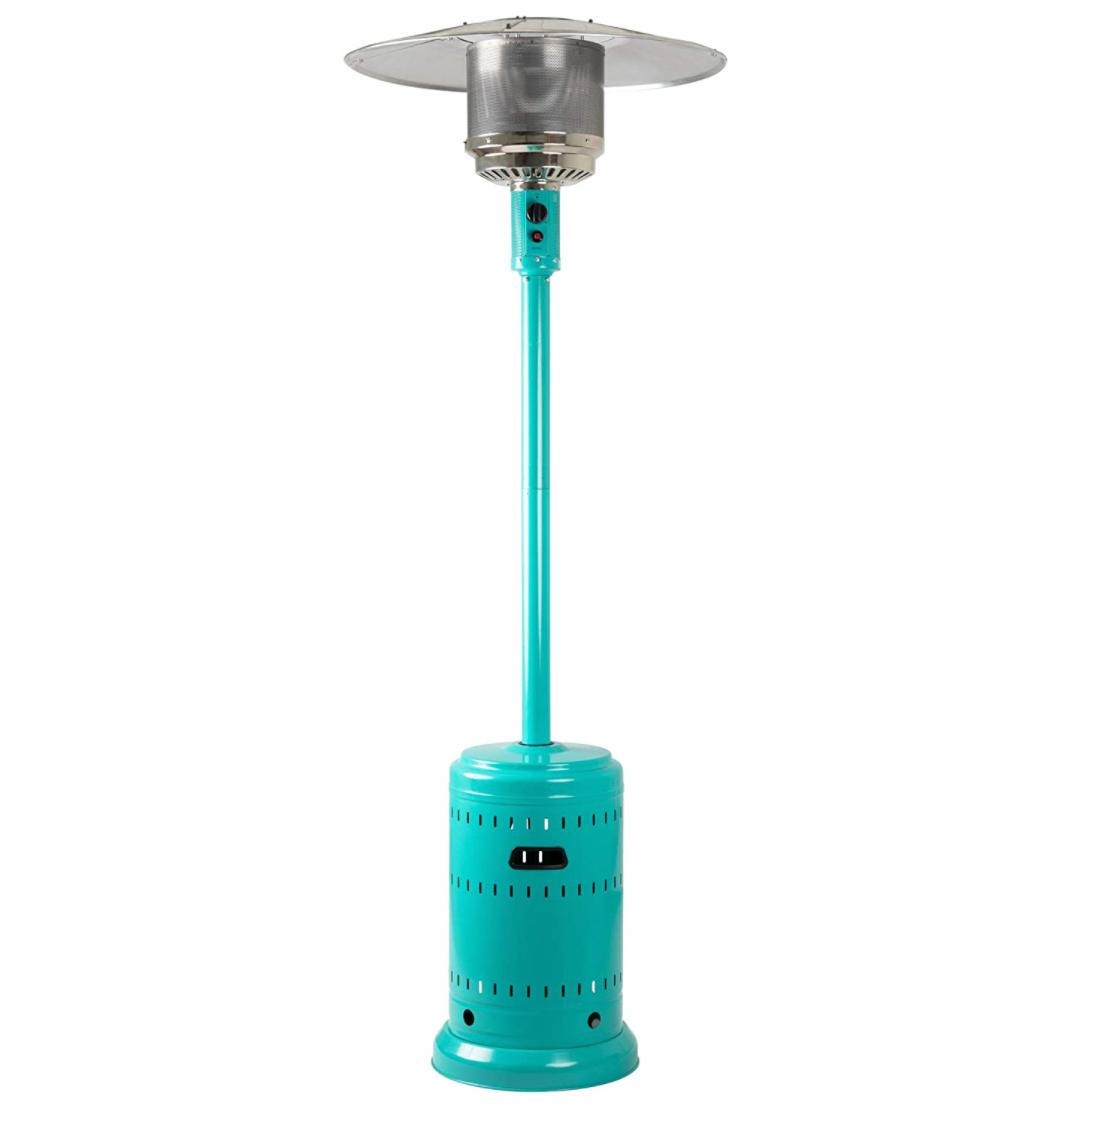 Amazon Basics 46,000 BTU Outdoor Propane Patio Heater